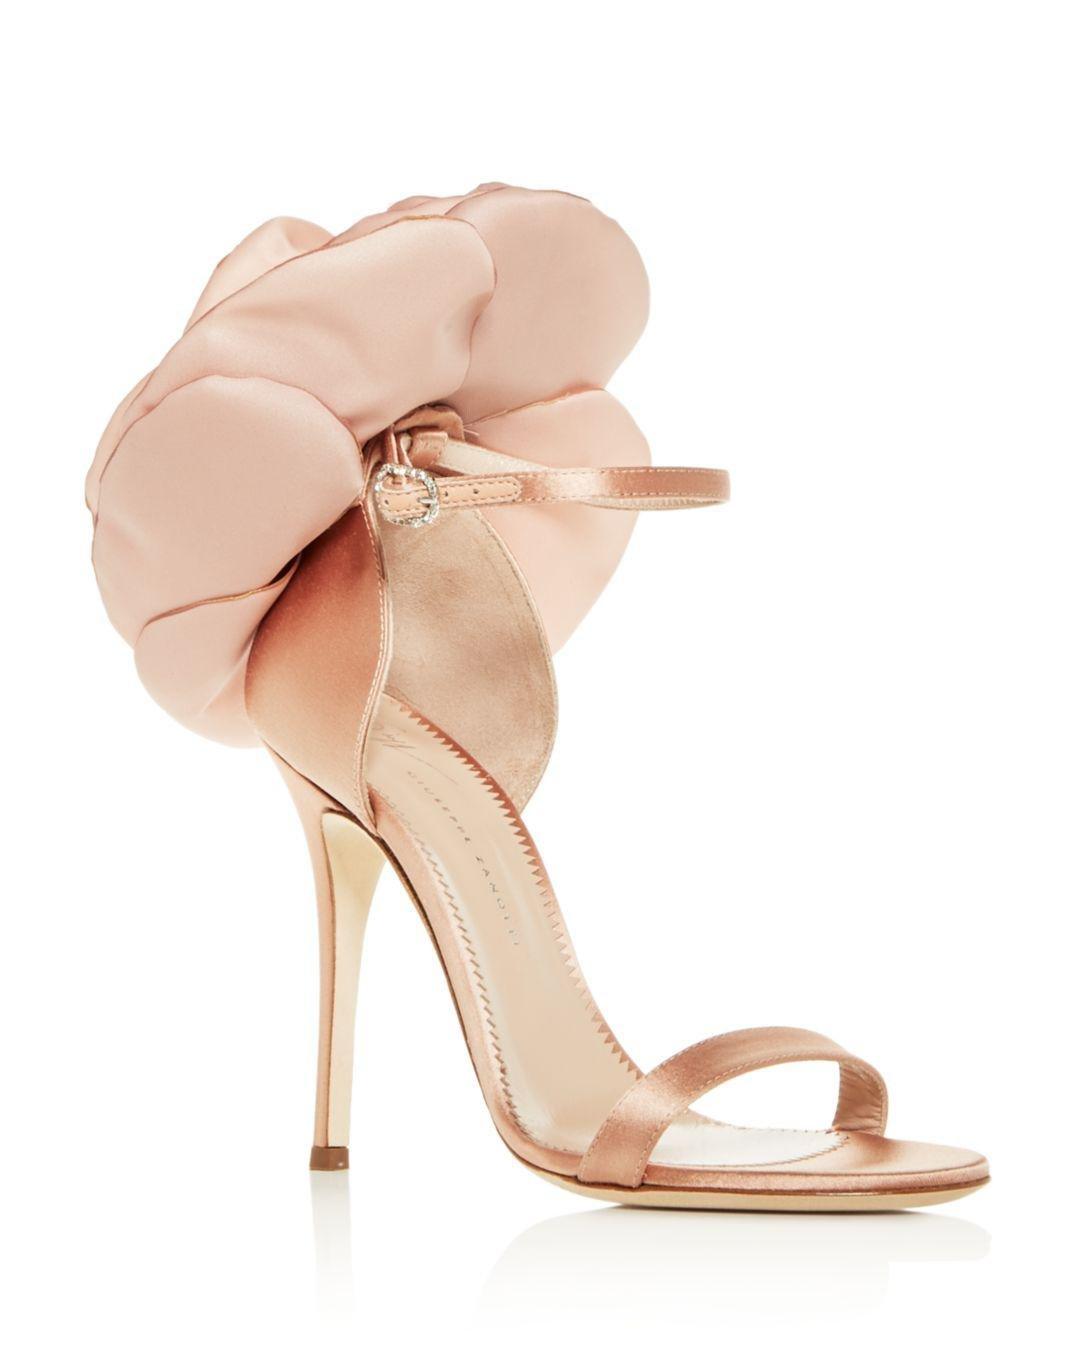 318566dc71be Lyst - Giuseppe Zanotti Women s Flower-embellished High-heel Sandals